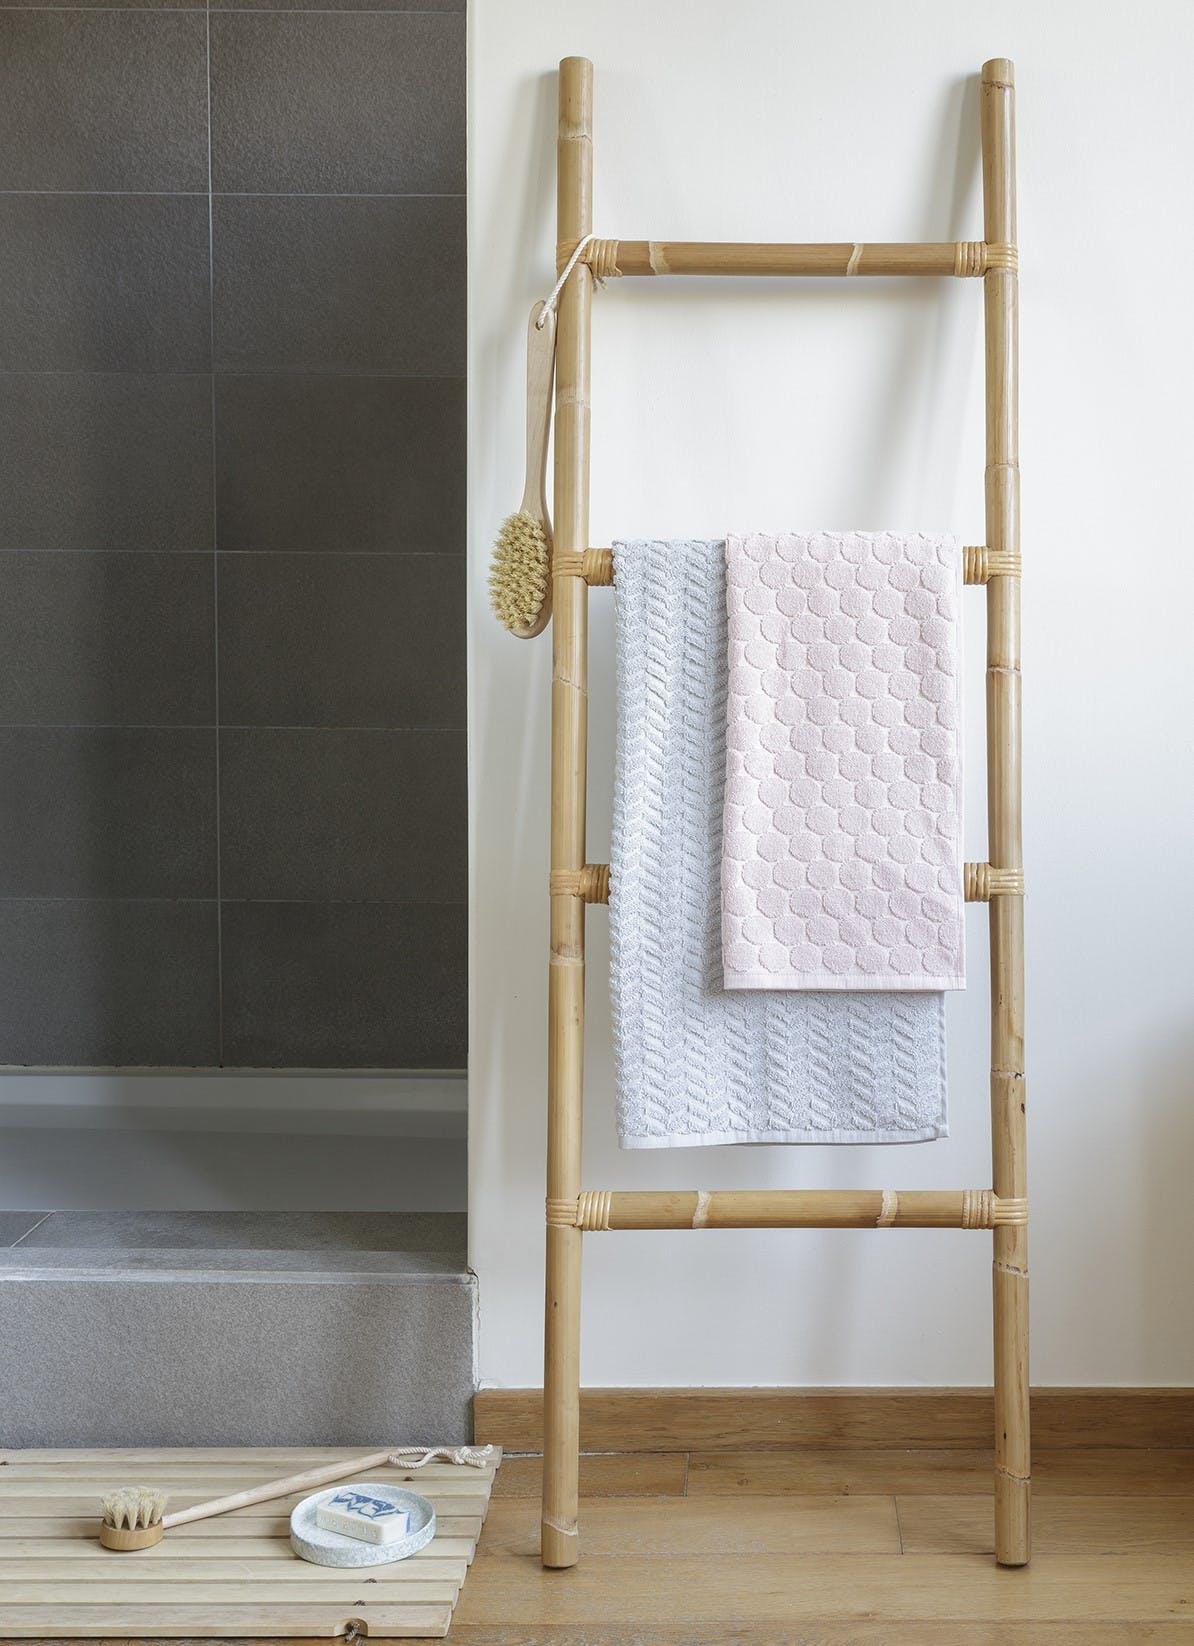 Echelle porte-serviettes rotin KOK